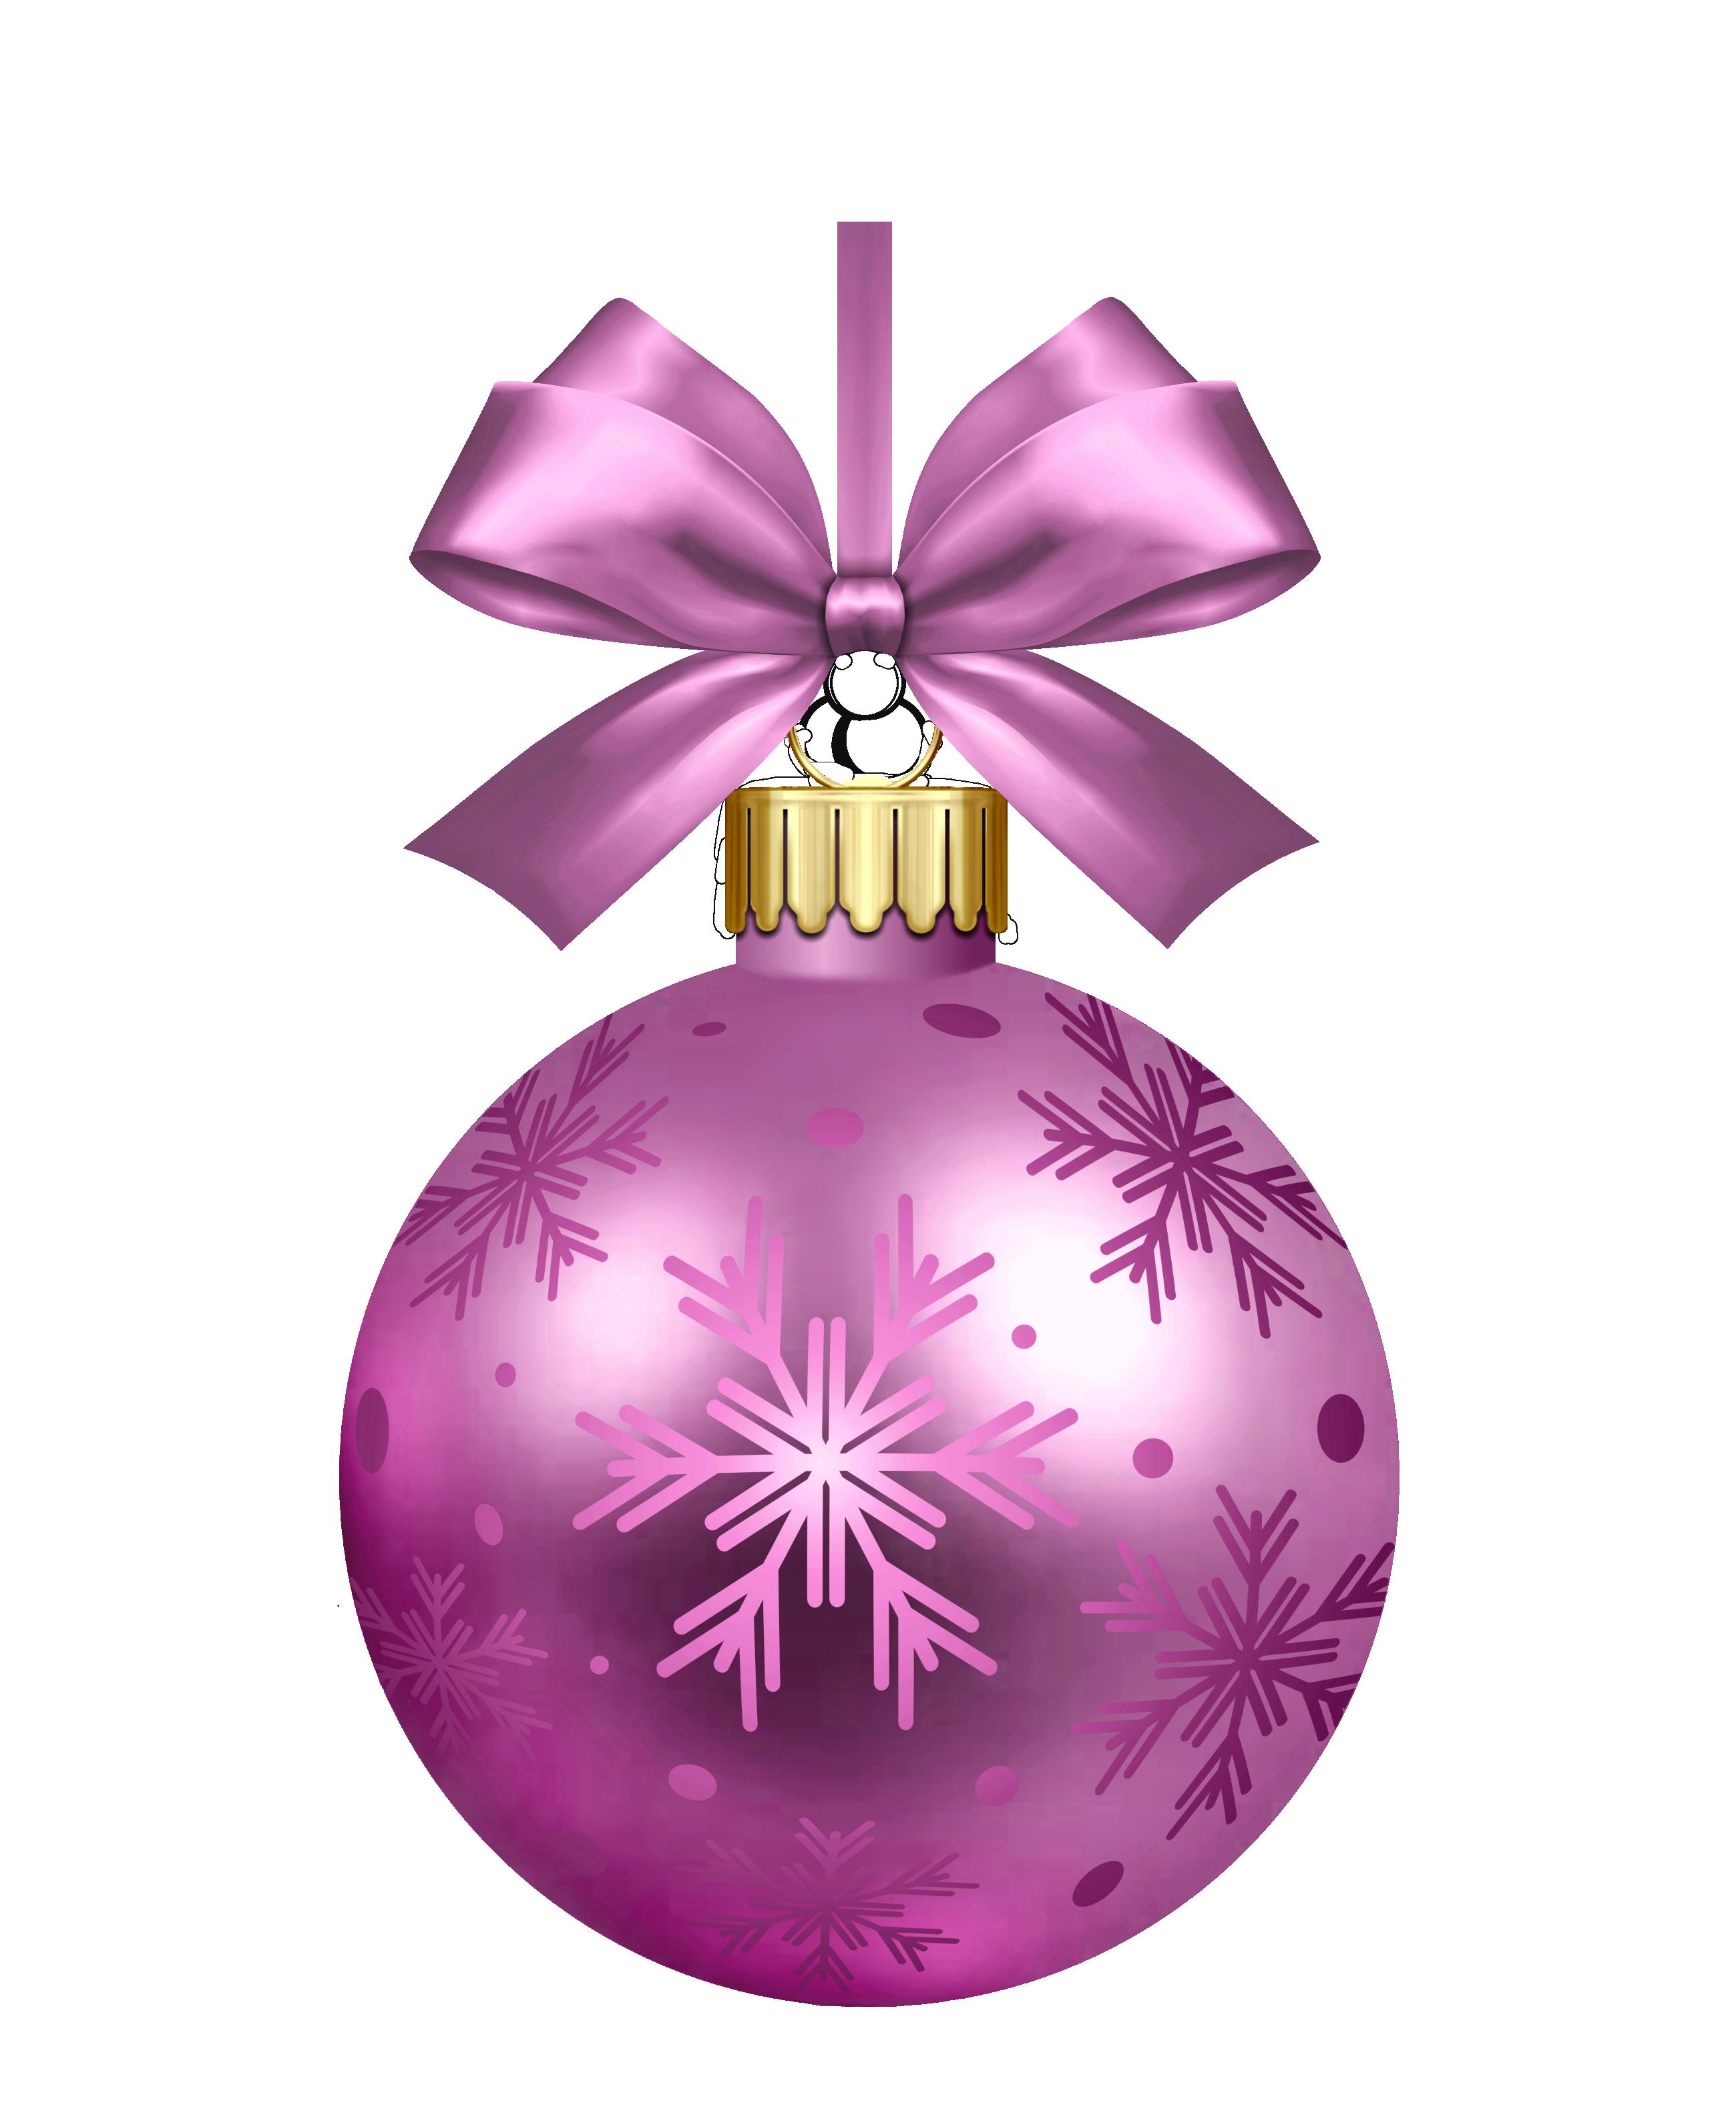 Purple Christmas Bauble PNG Image